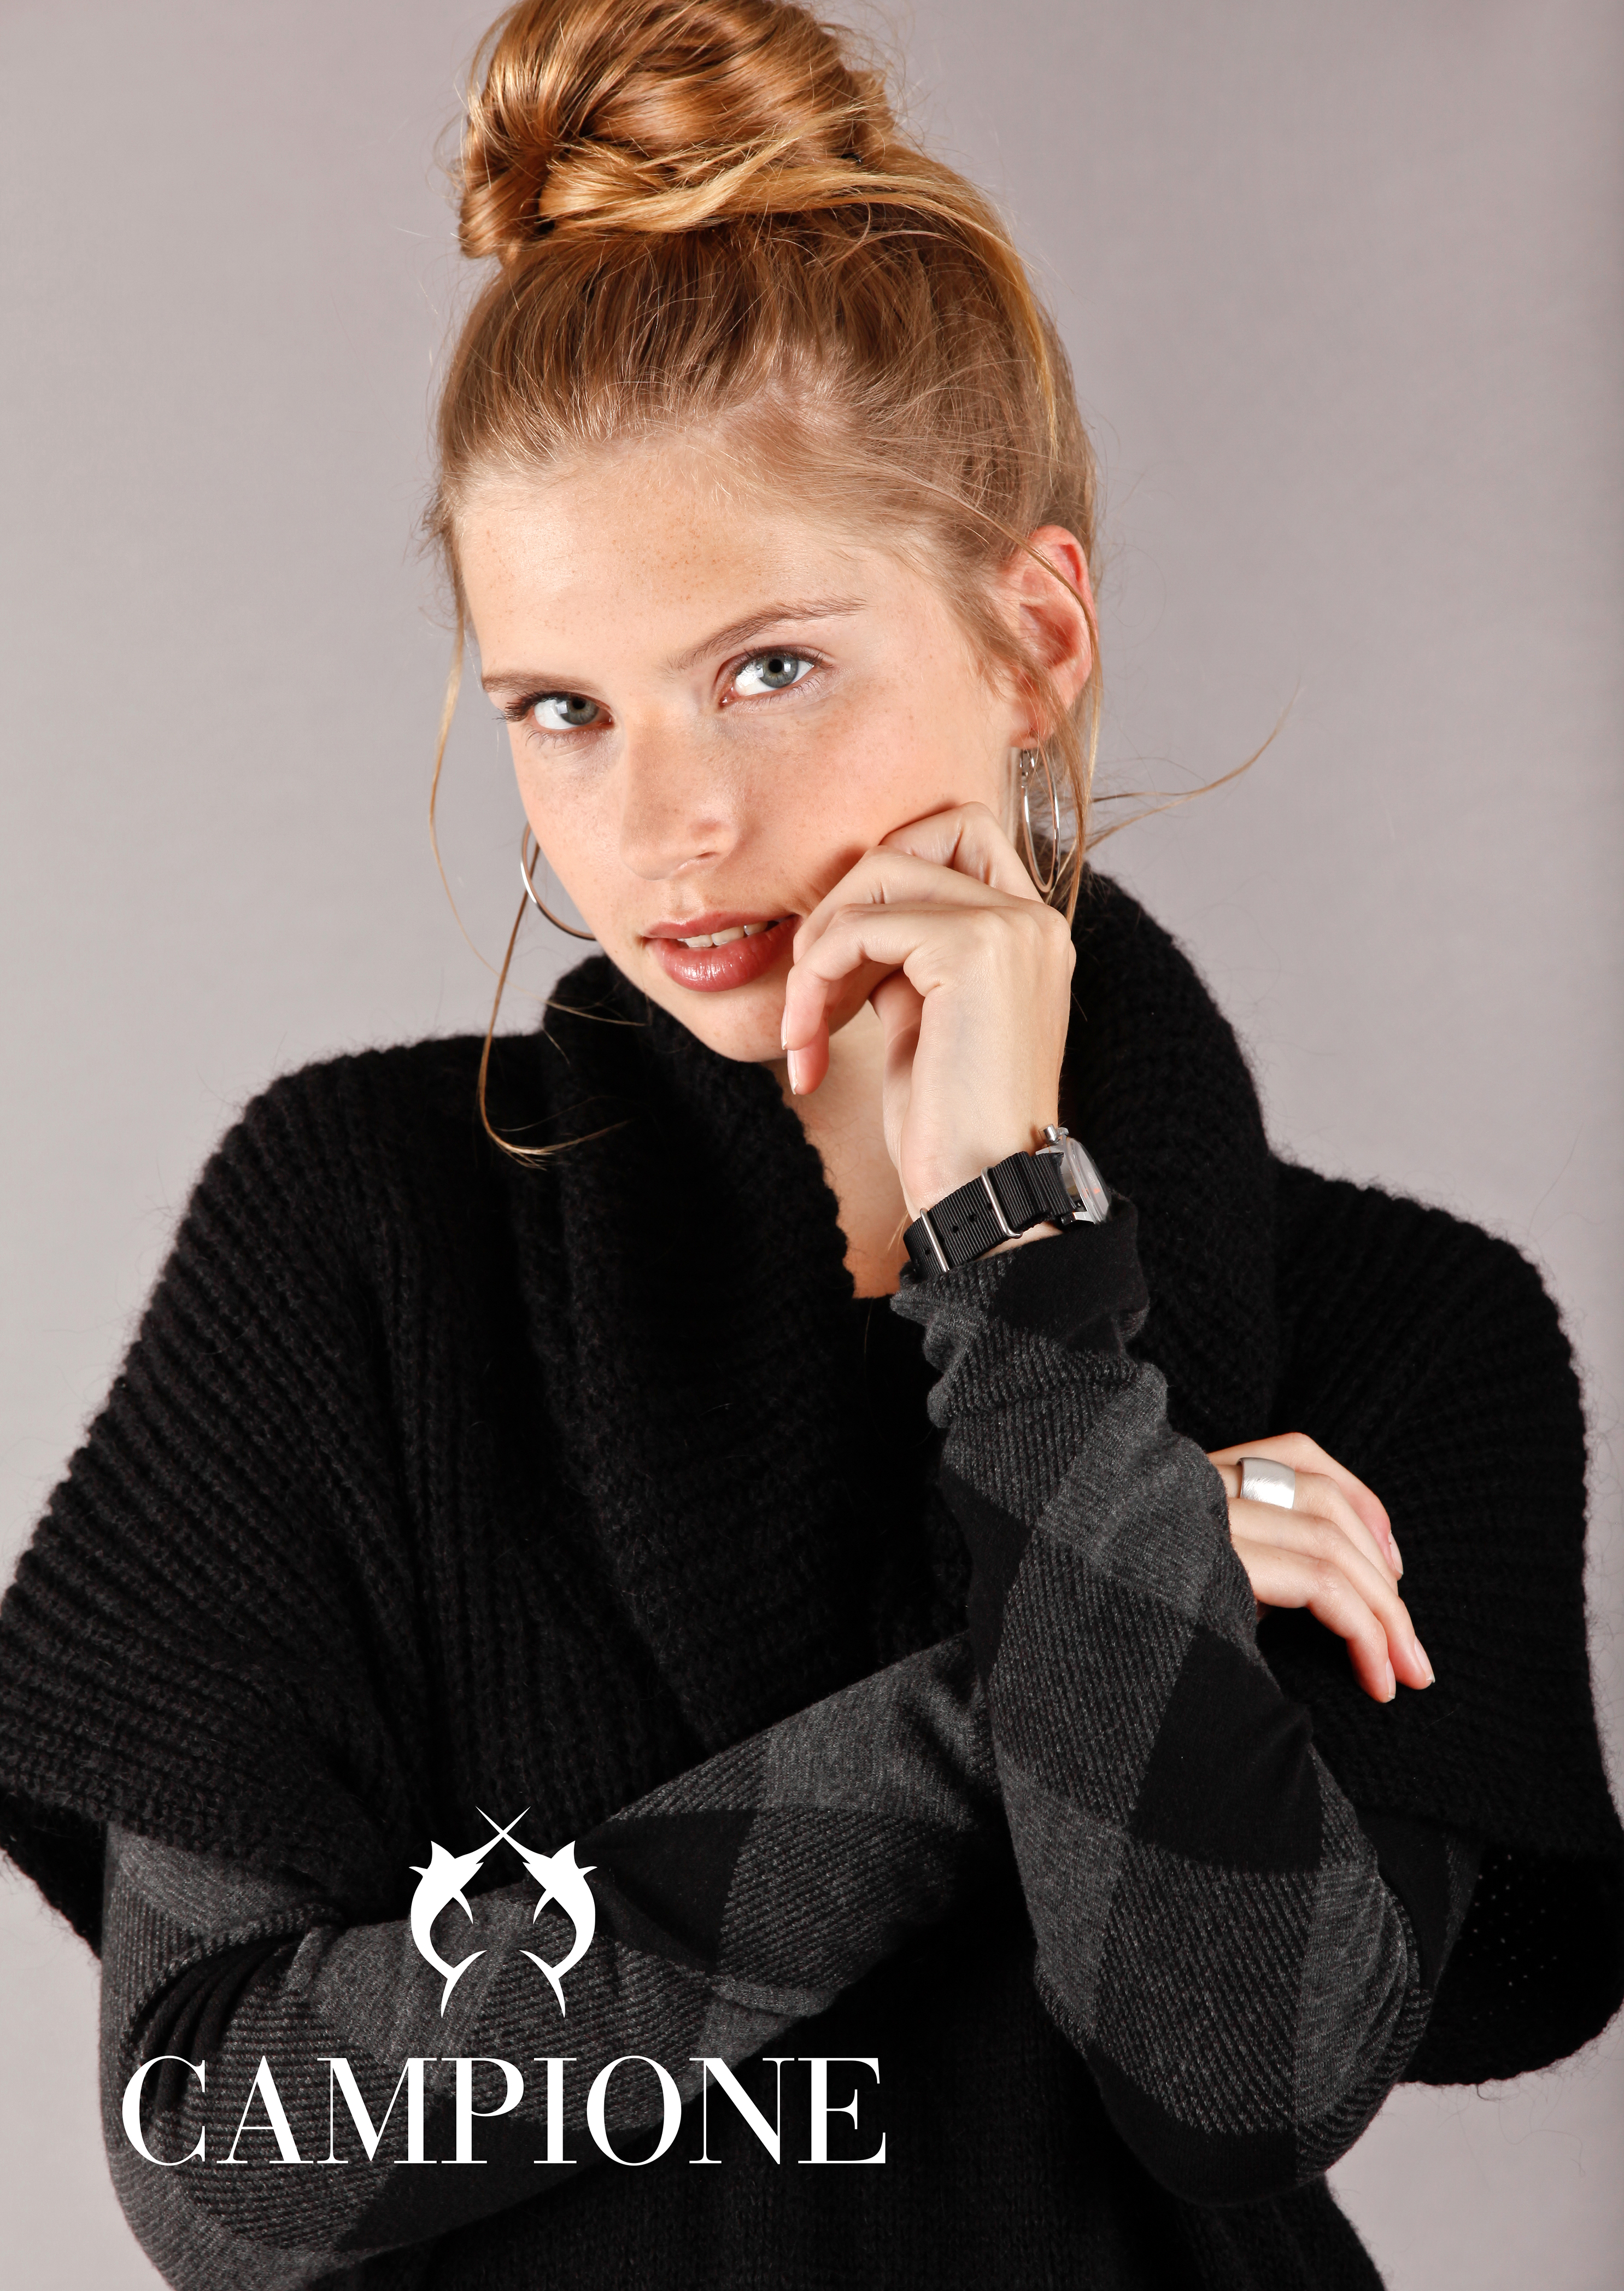 Lisa Campione 07.jpg